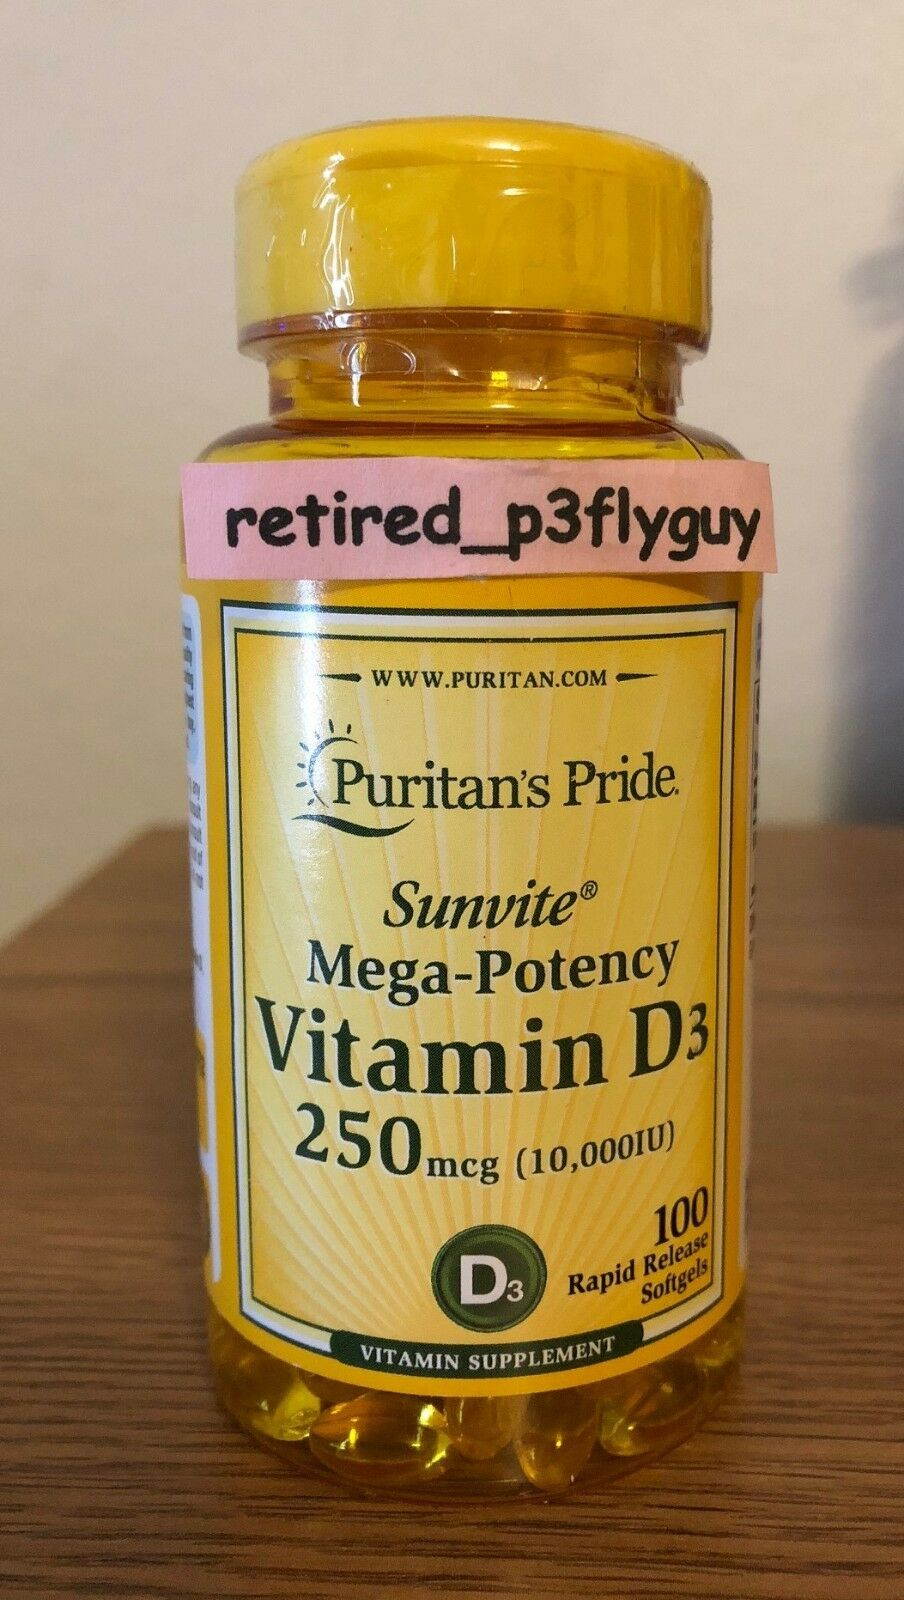 Puritan's Pride Mega Potency Vitamin D3 10,000 IU - 100 Soft